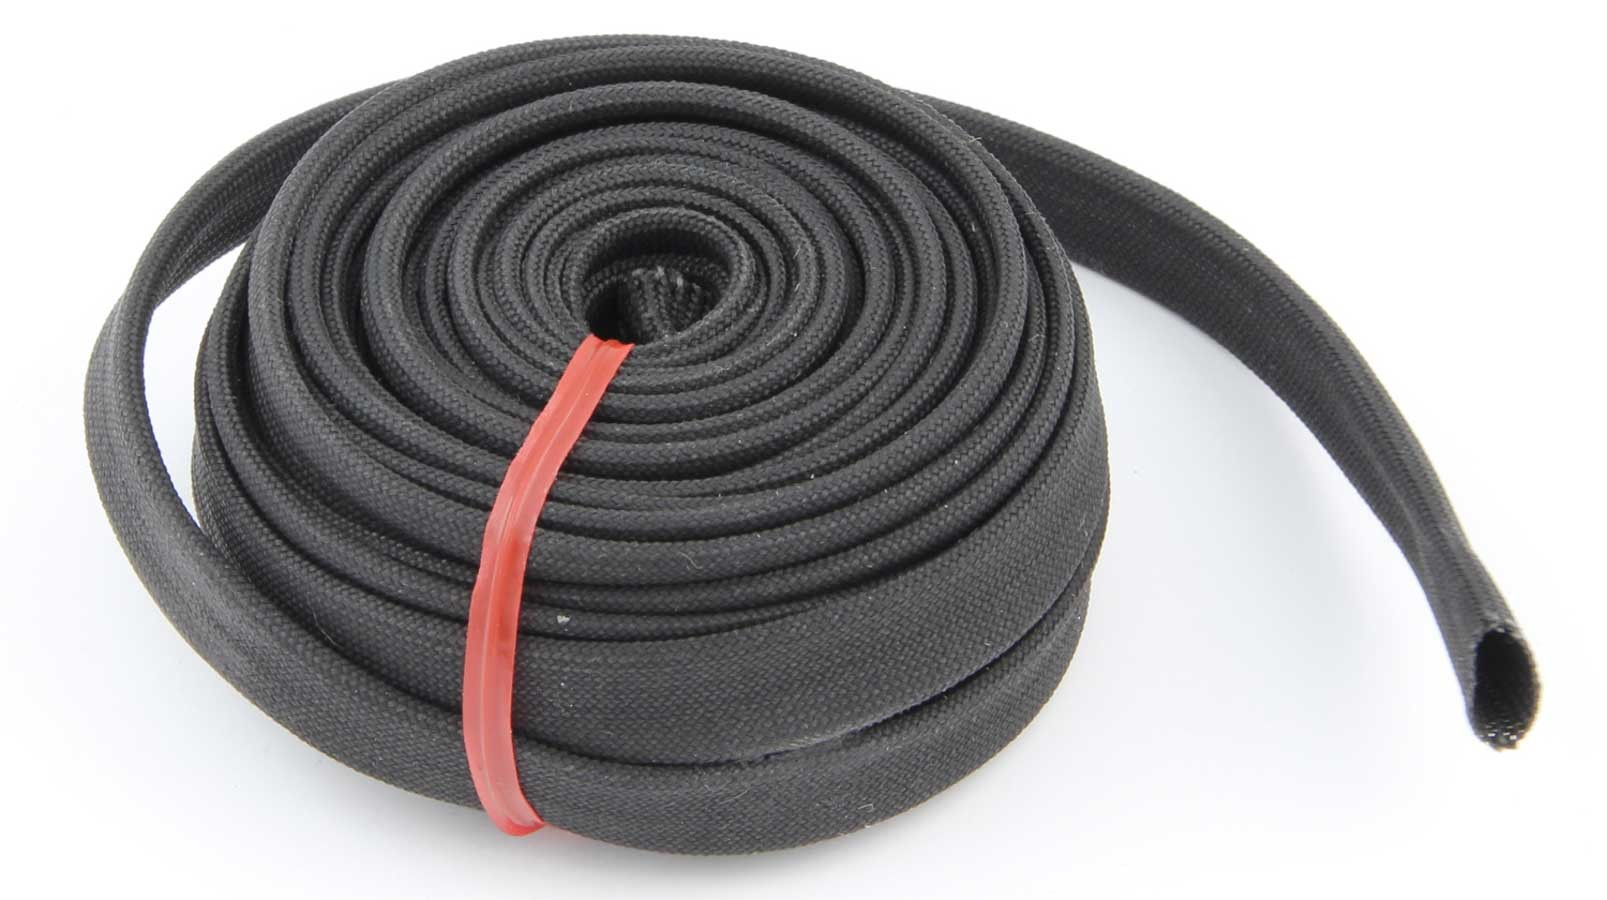 Taylor 2580 Black Thermal Protective Sleeving